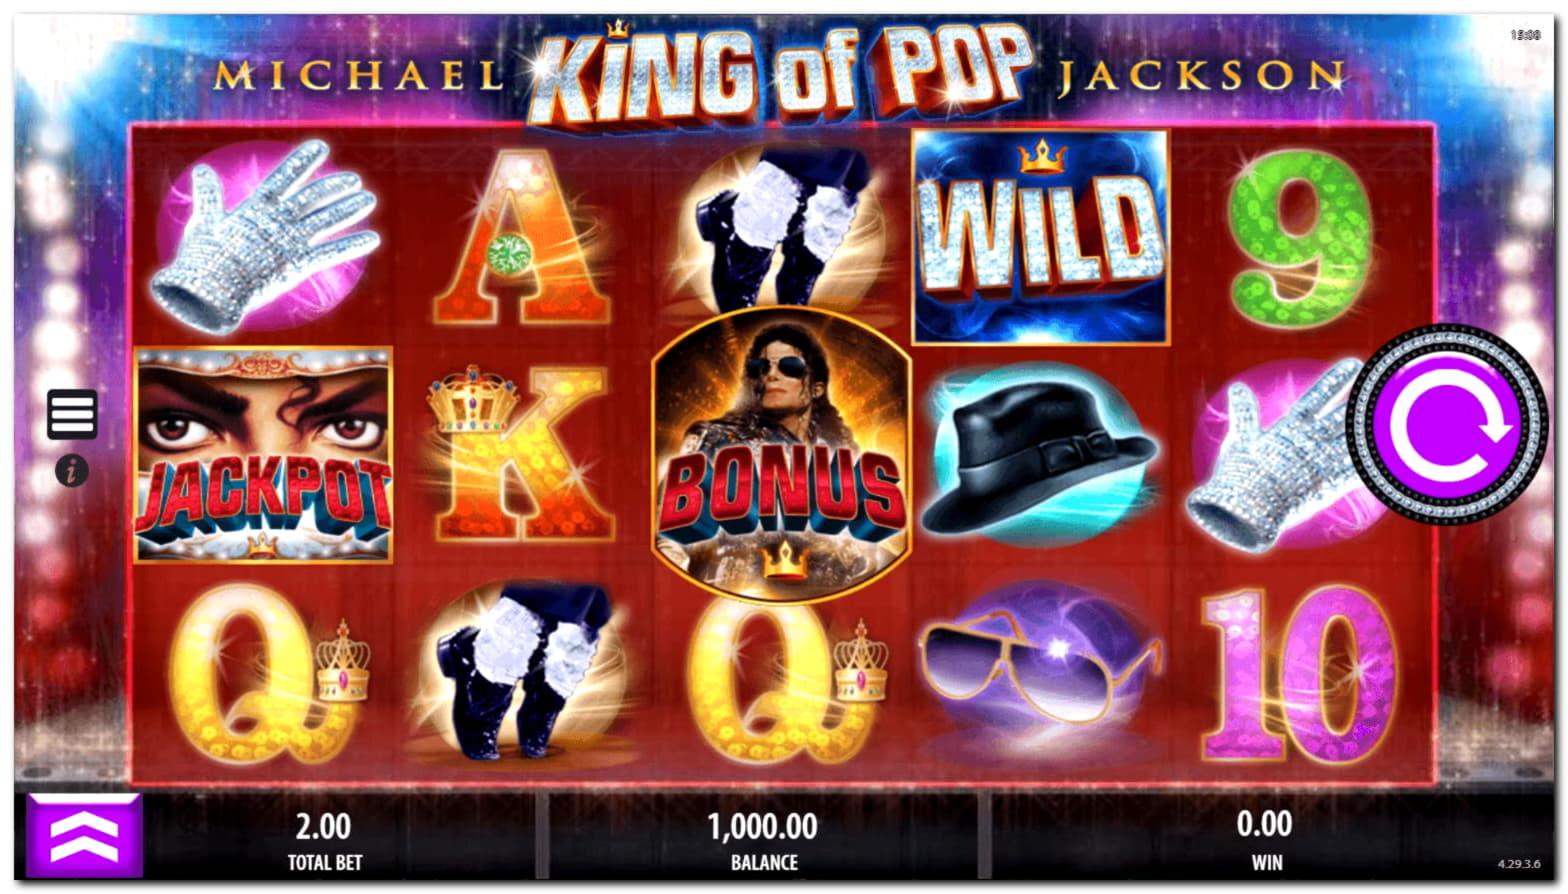 295 Free Spins no deposit at Wix Stars Casino